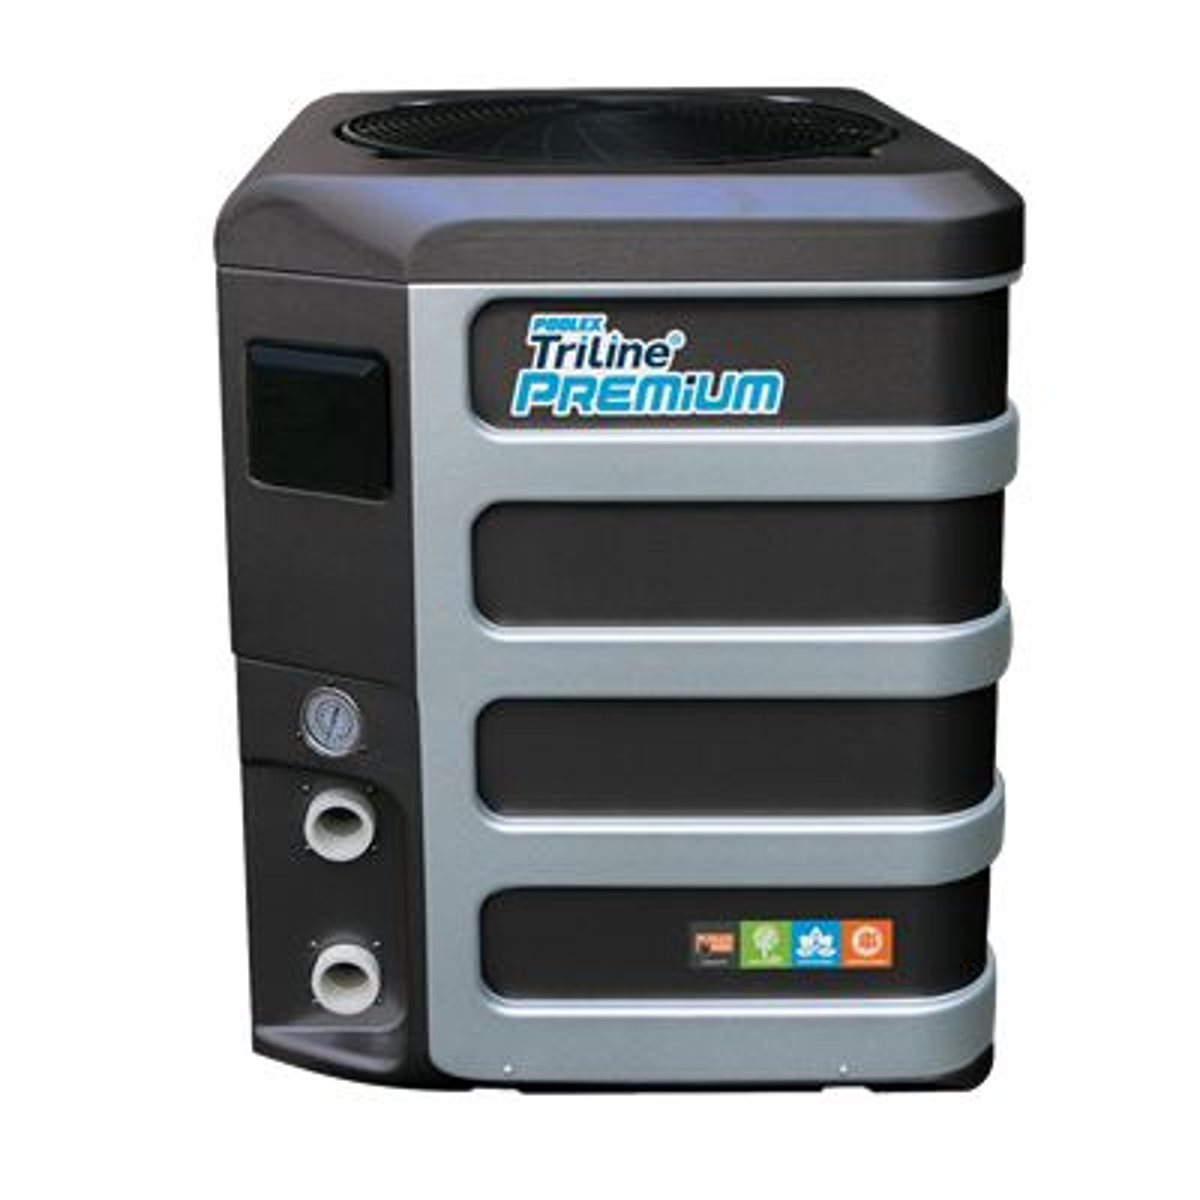 Pompe à chaleur Poolex Triline Premium WiFi